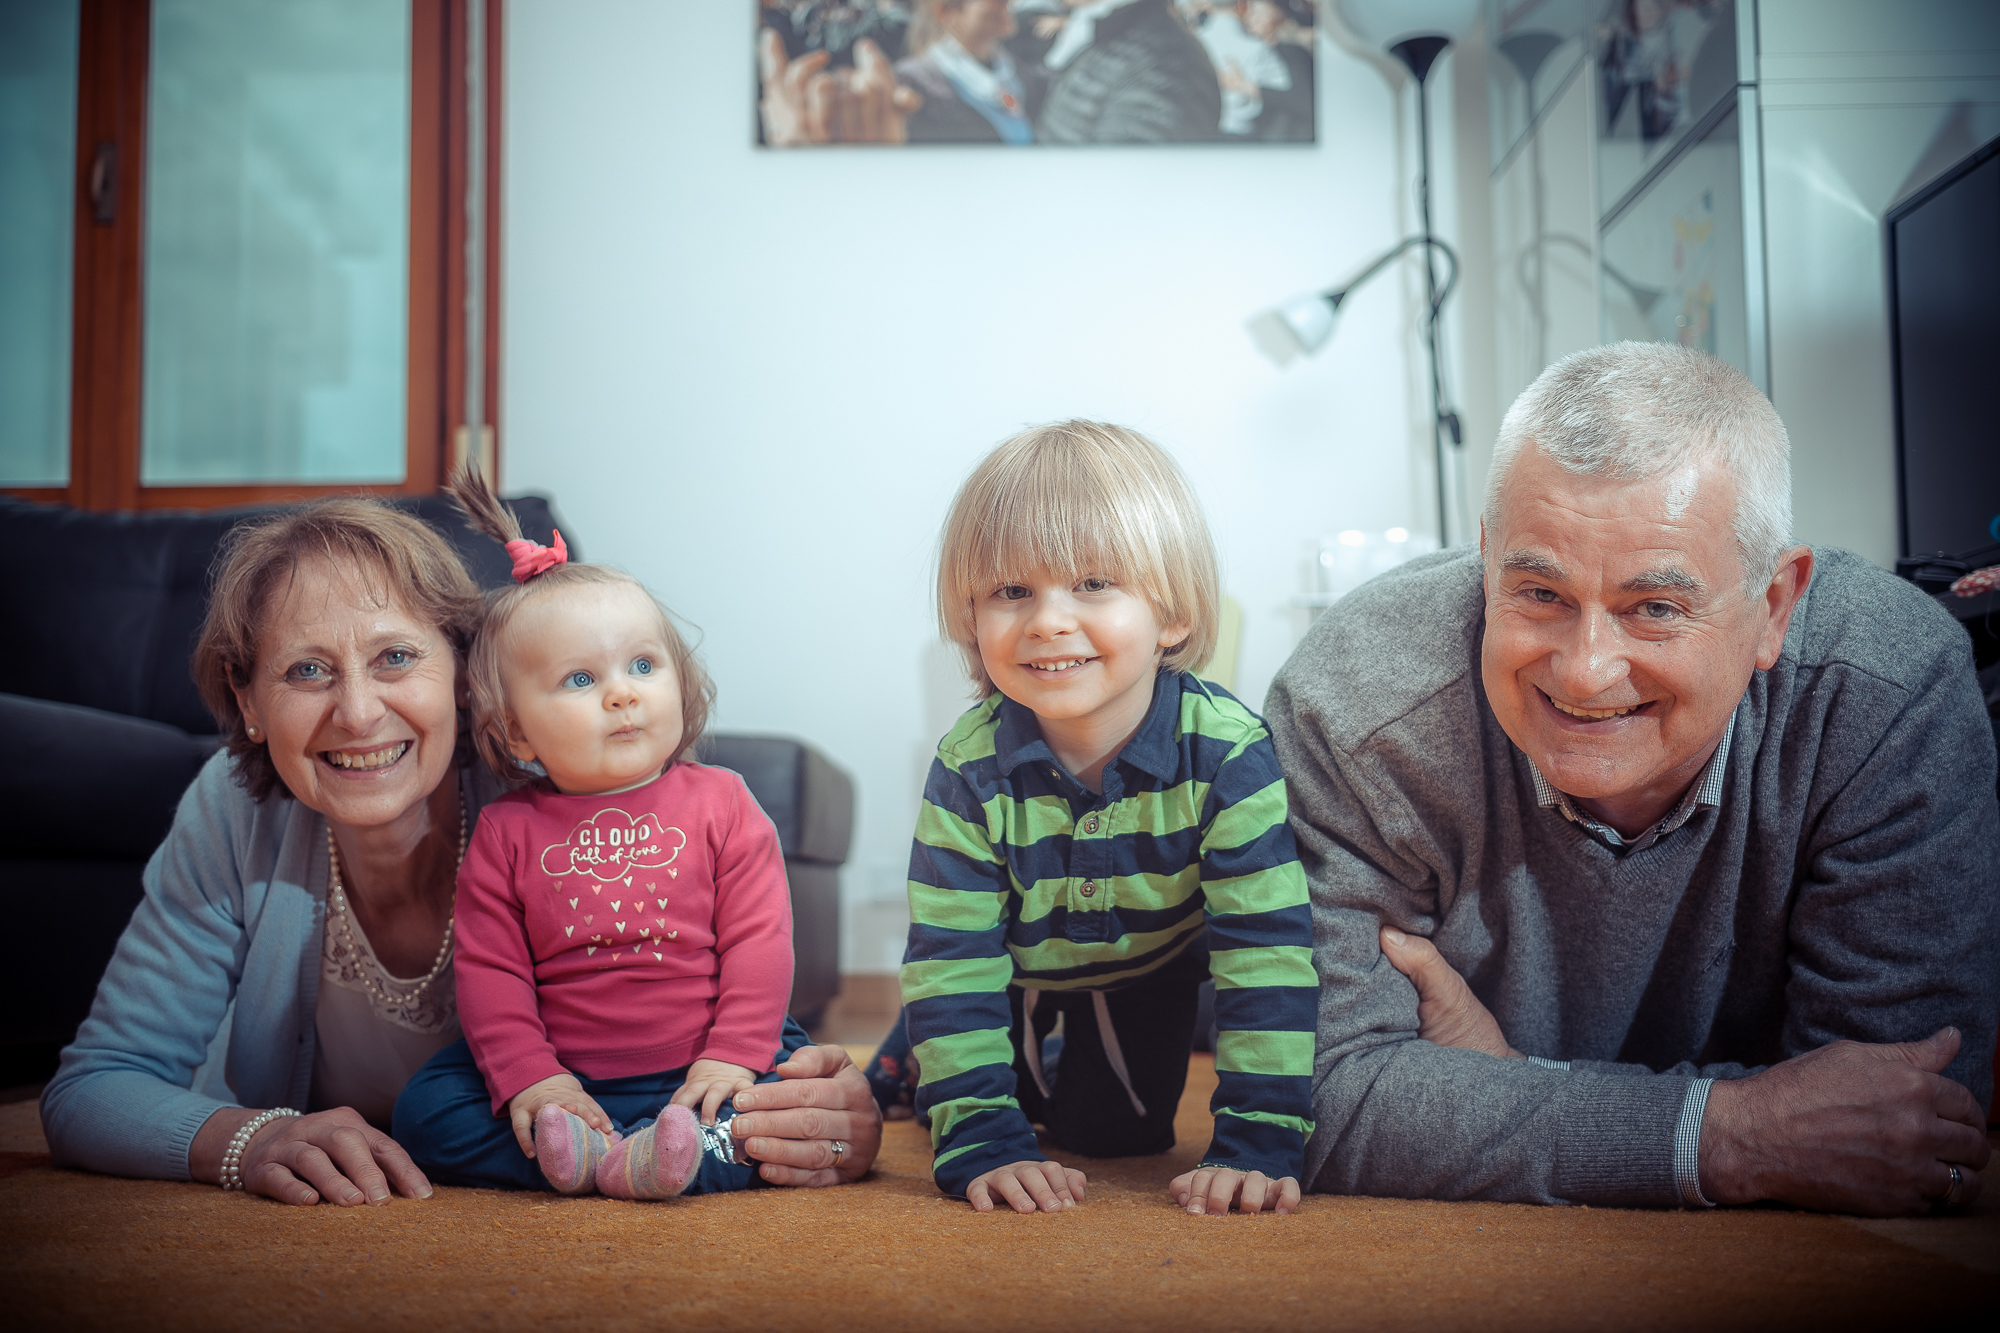 Fotografie di famiglia felice - fotobarinova.eu